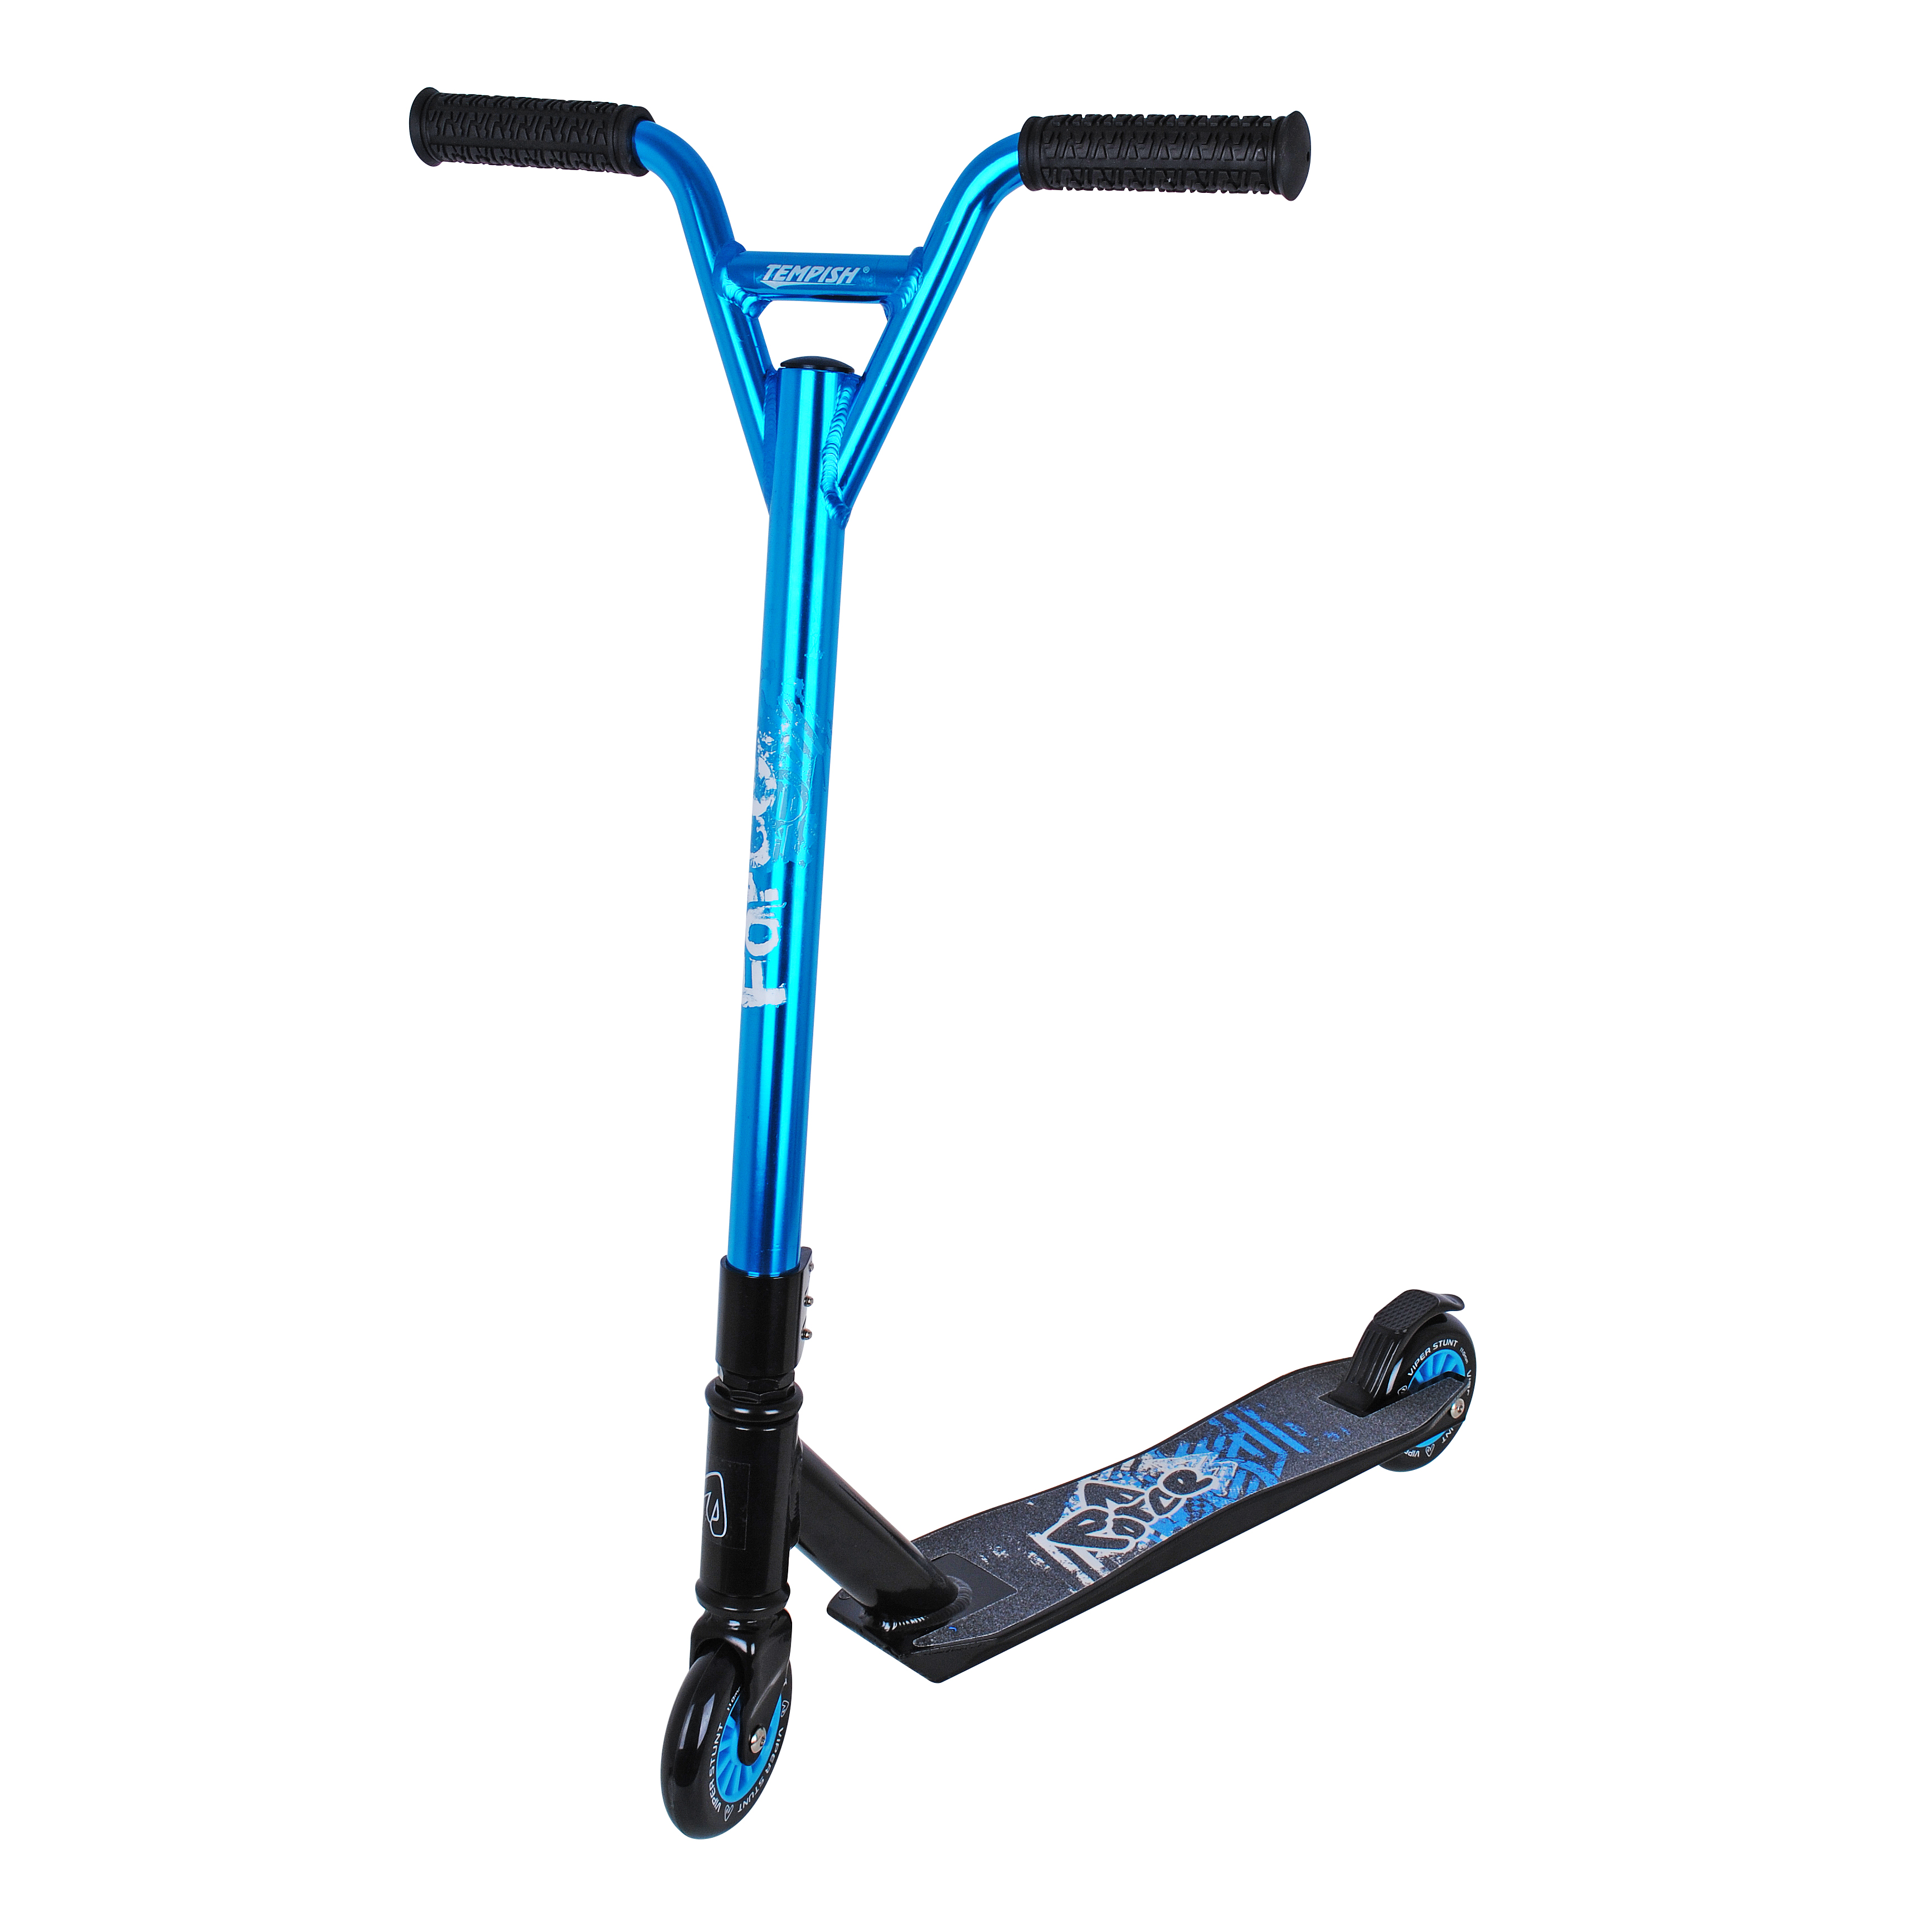 Самокат TEMPISH 2017 VIPER 110 blue, Самокаты - арт. 833610433